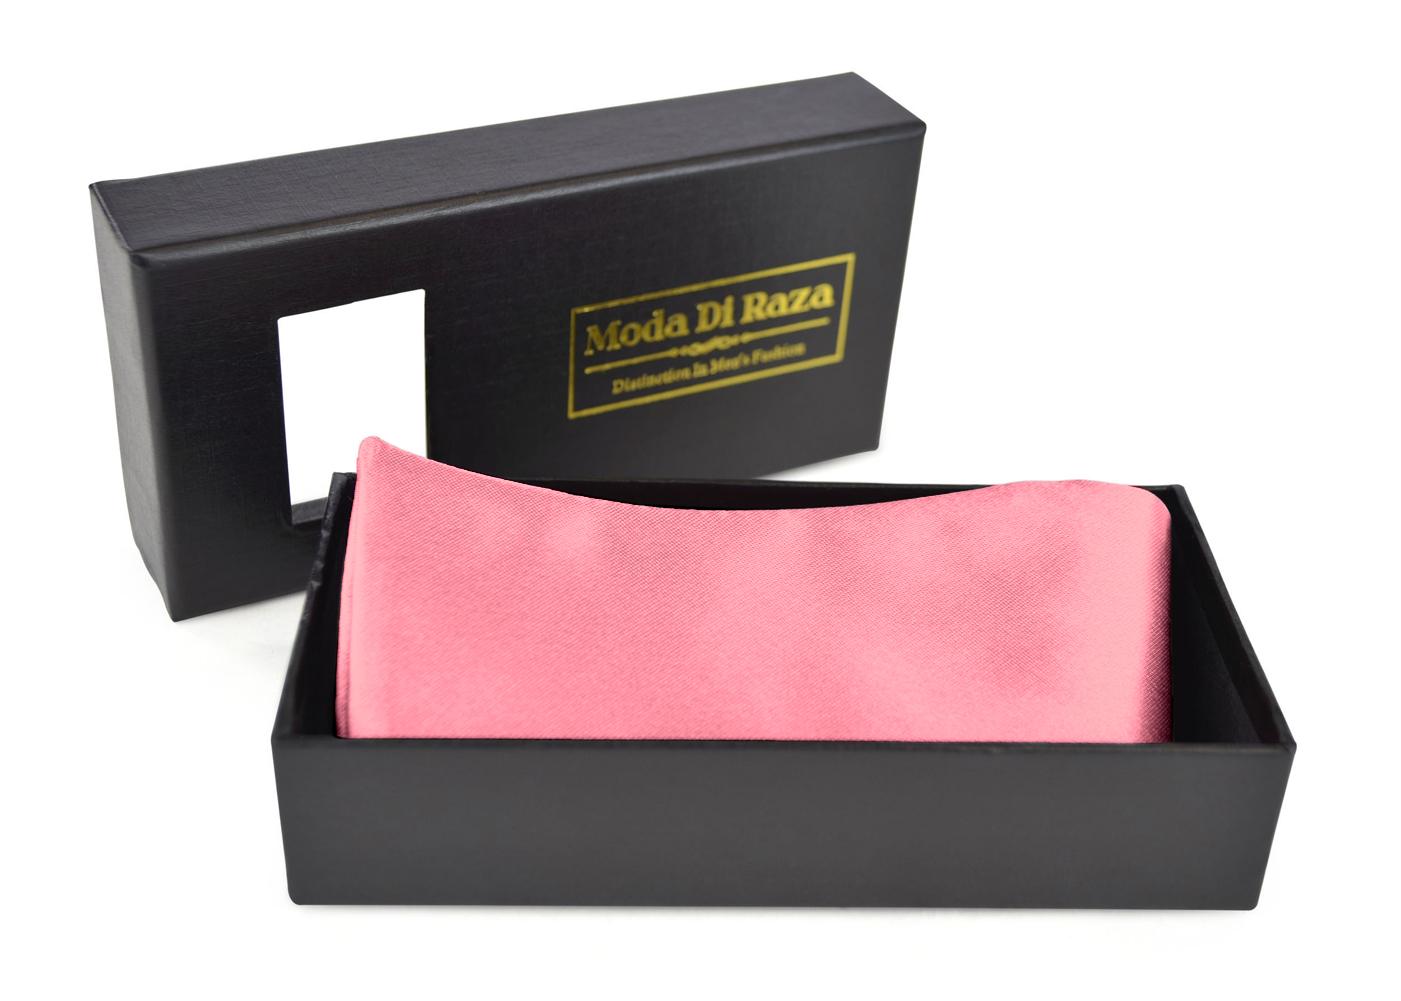 Bow Ties For Men's Adjustable Self Tied Gift Box Moda Di Raza - Carnation Pink